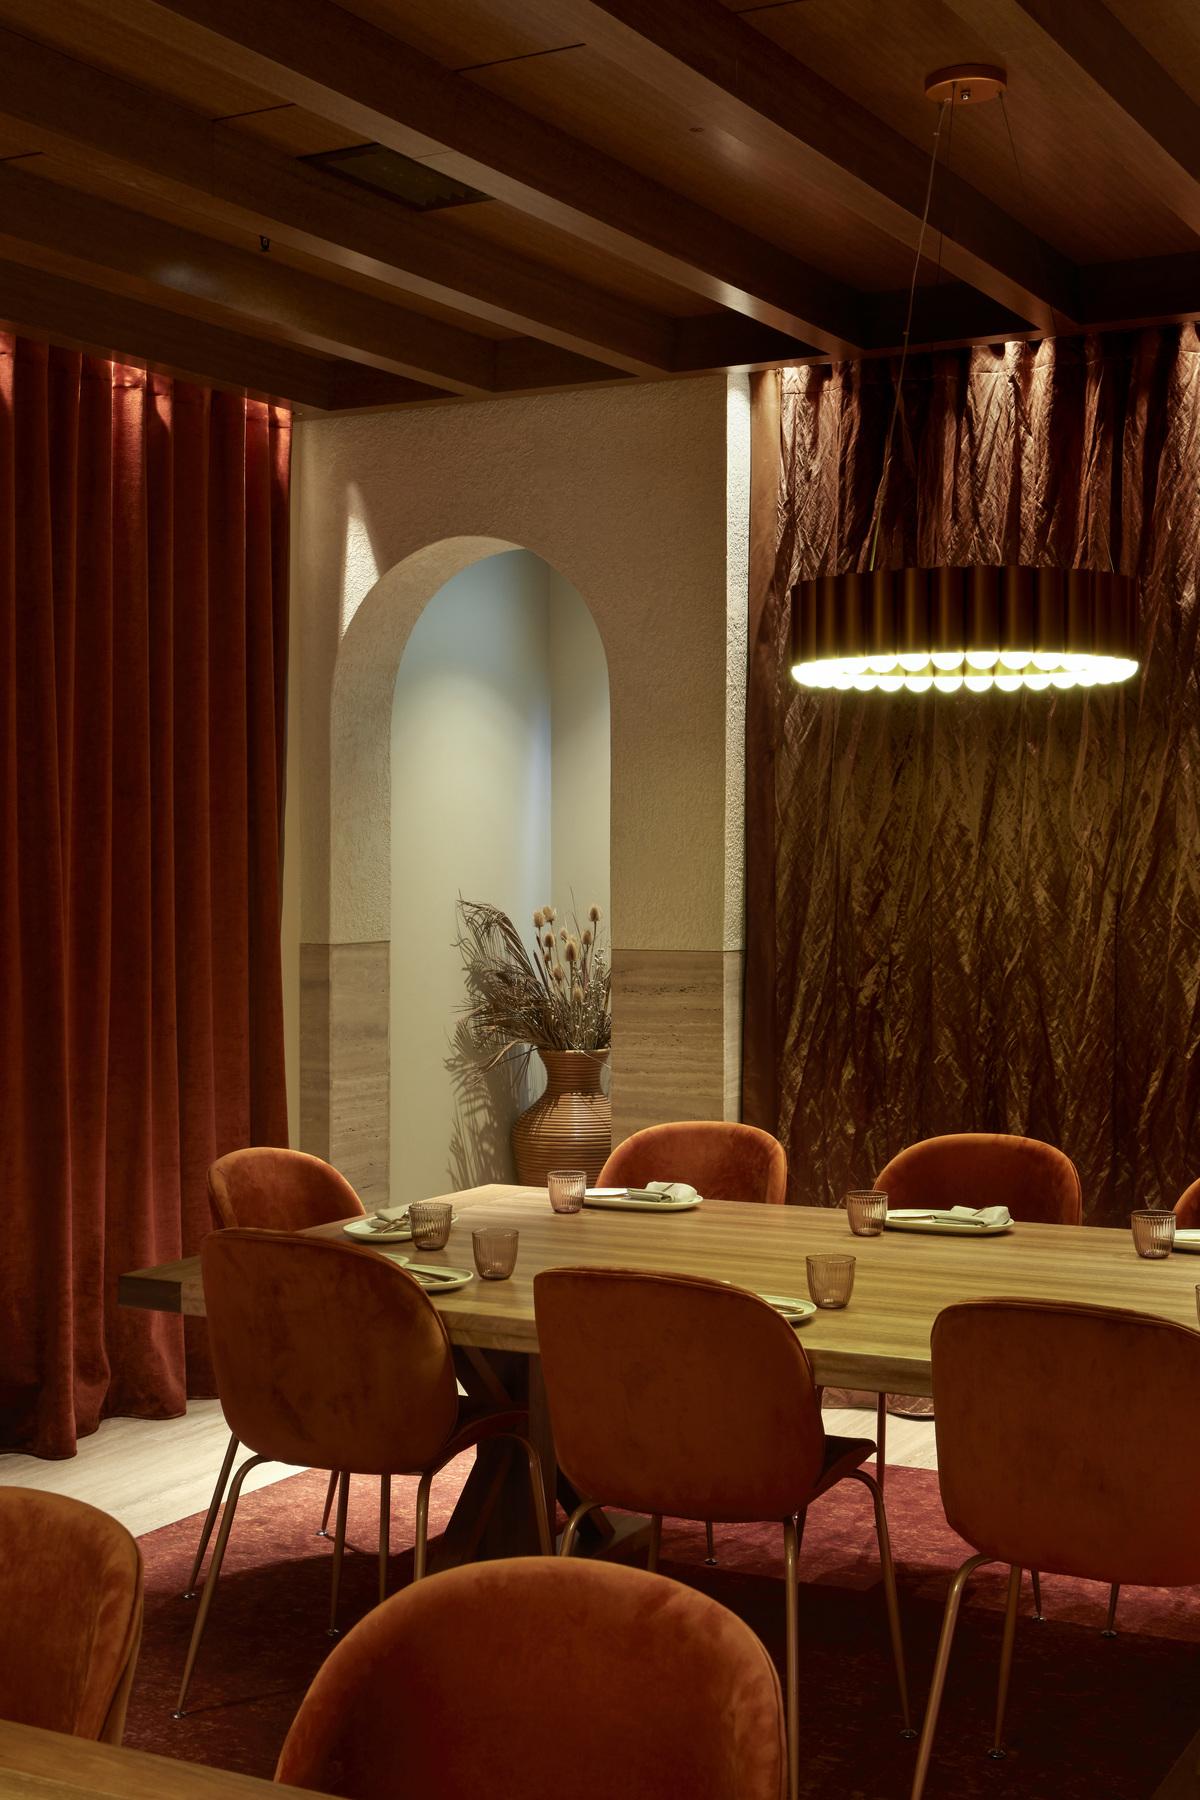 Bablyon bar and restaurant